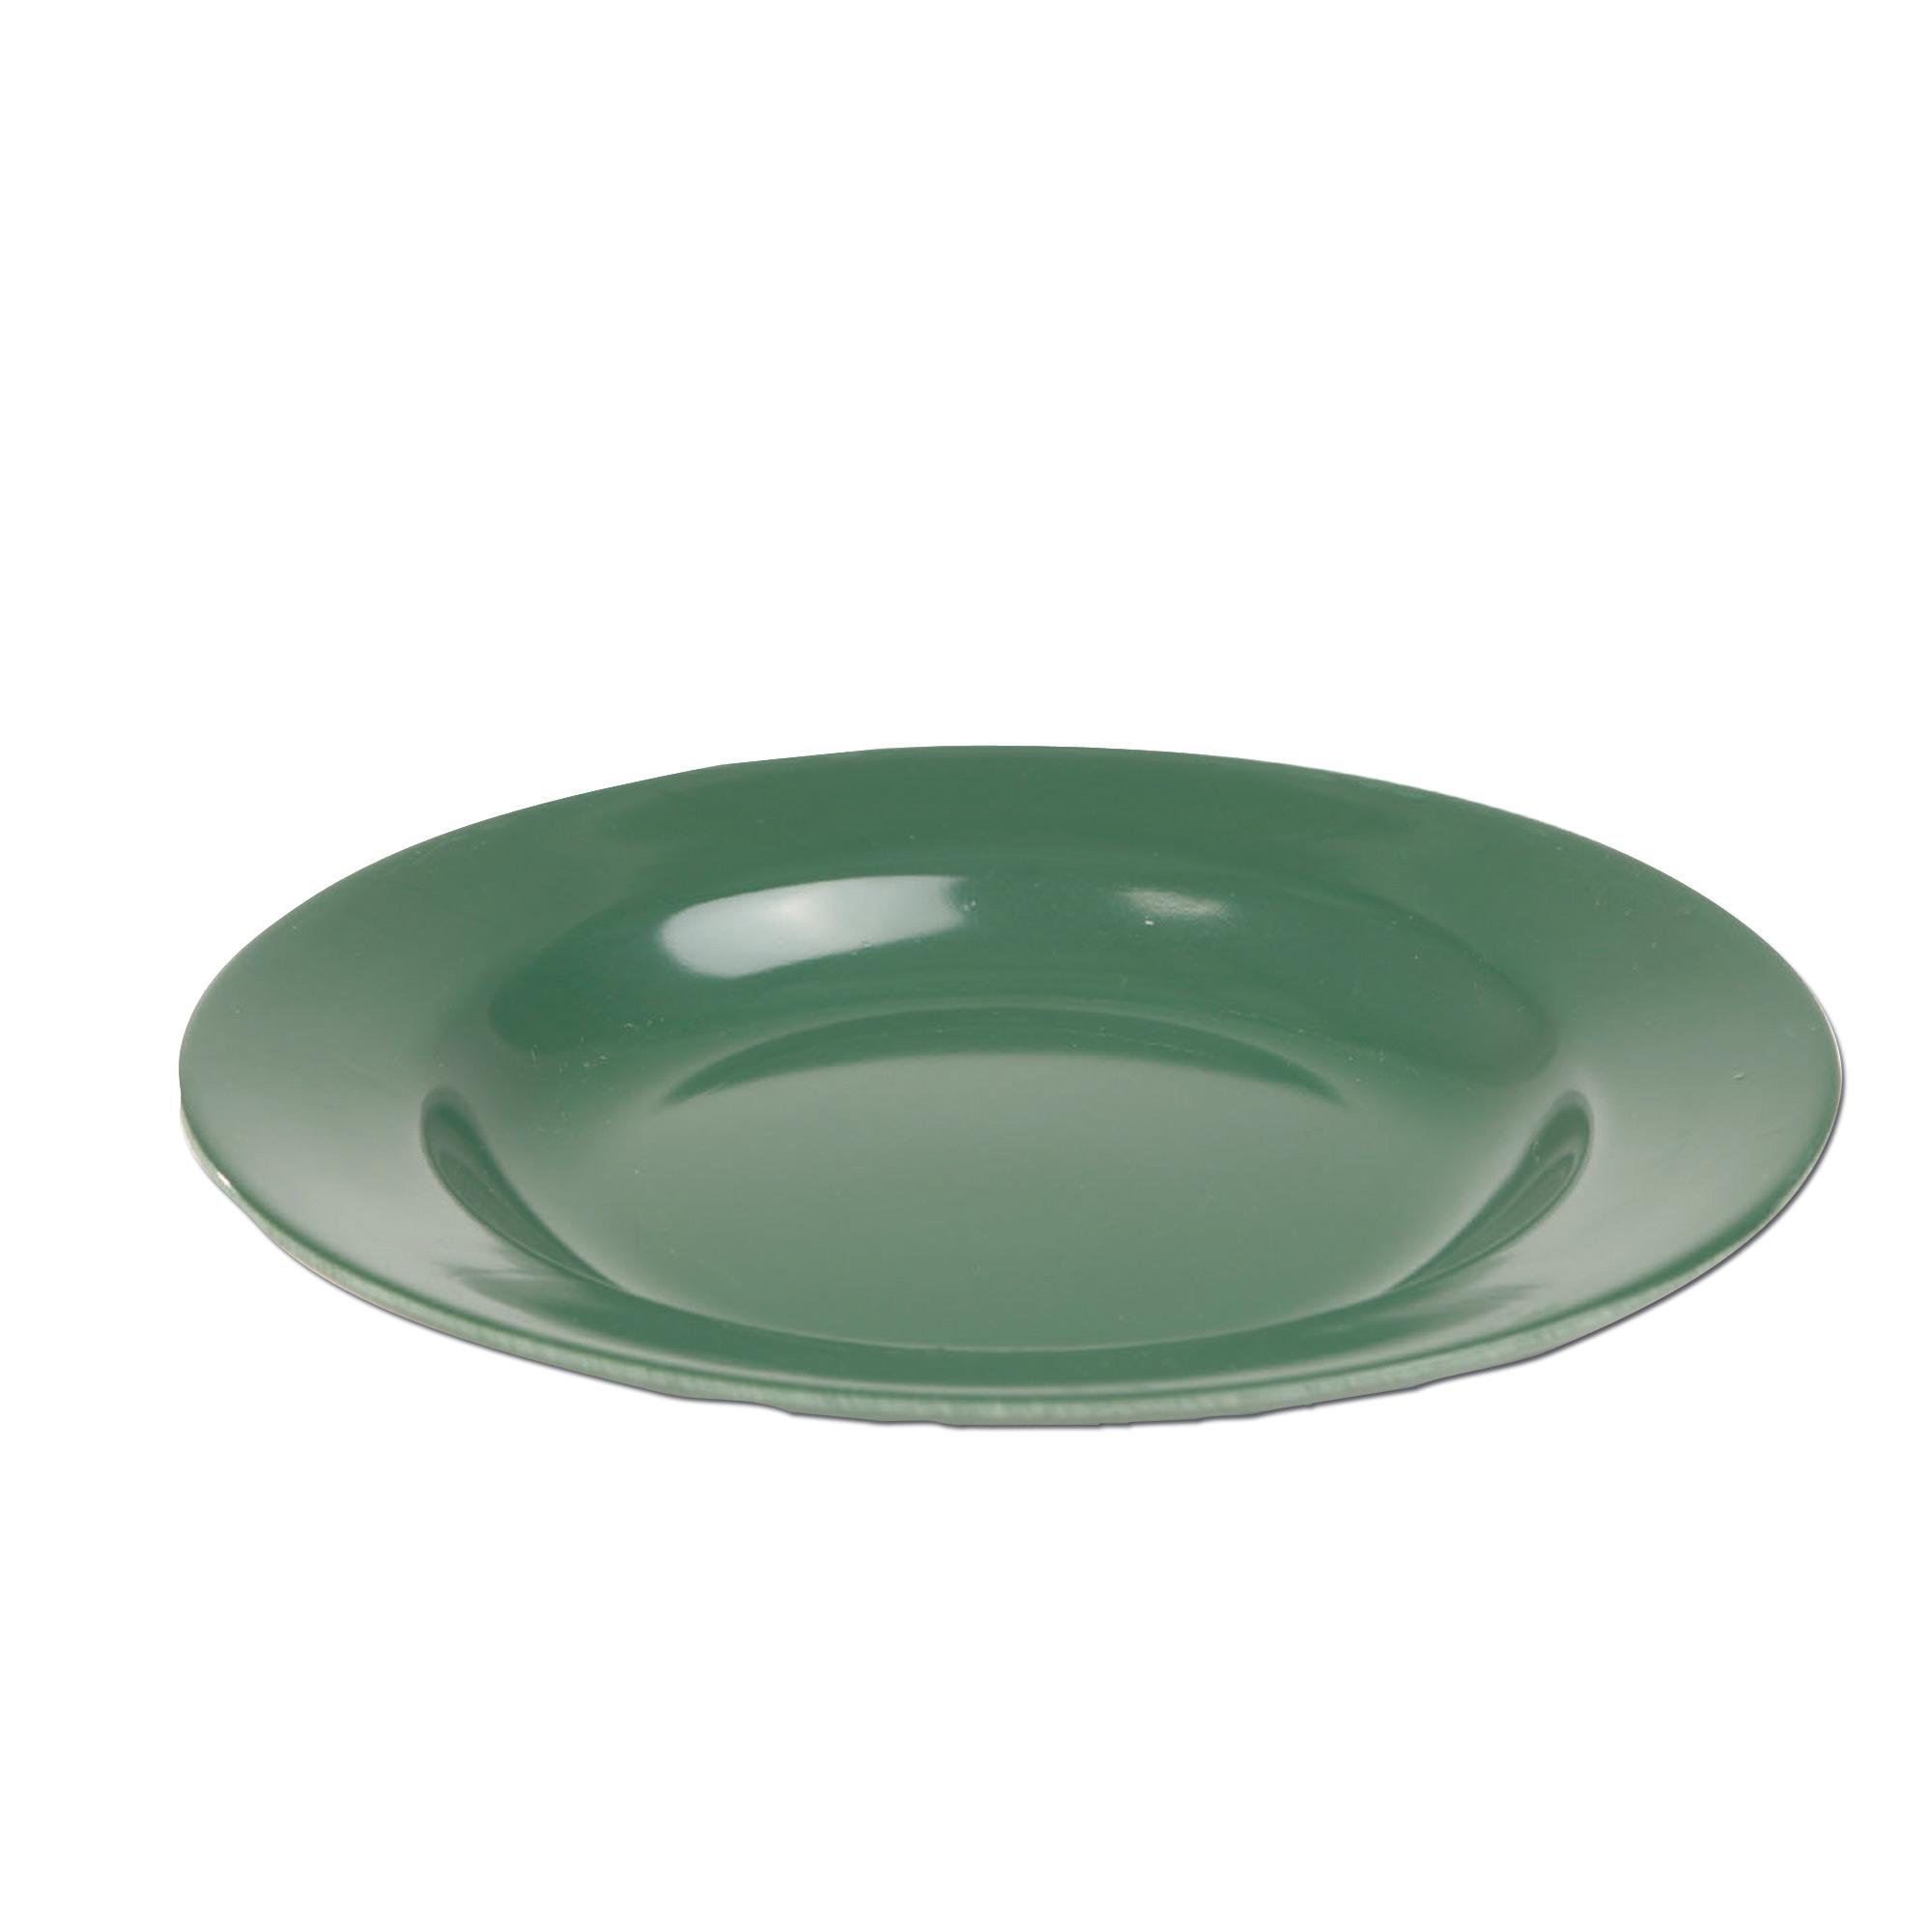 Teller Plastik flach oliv